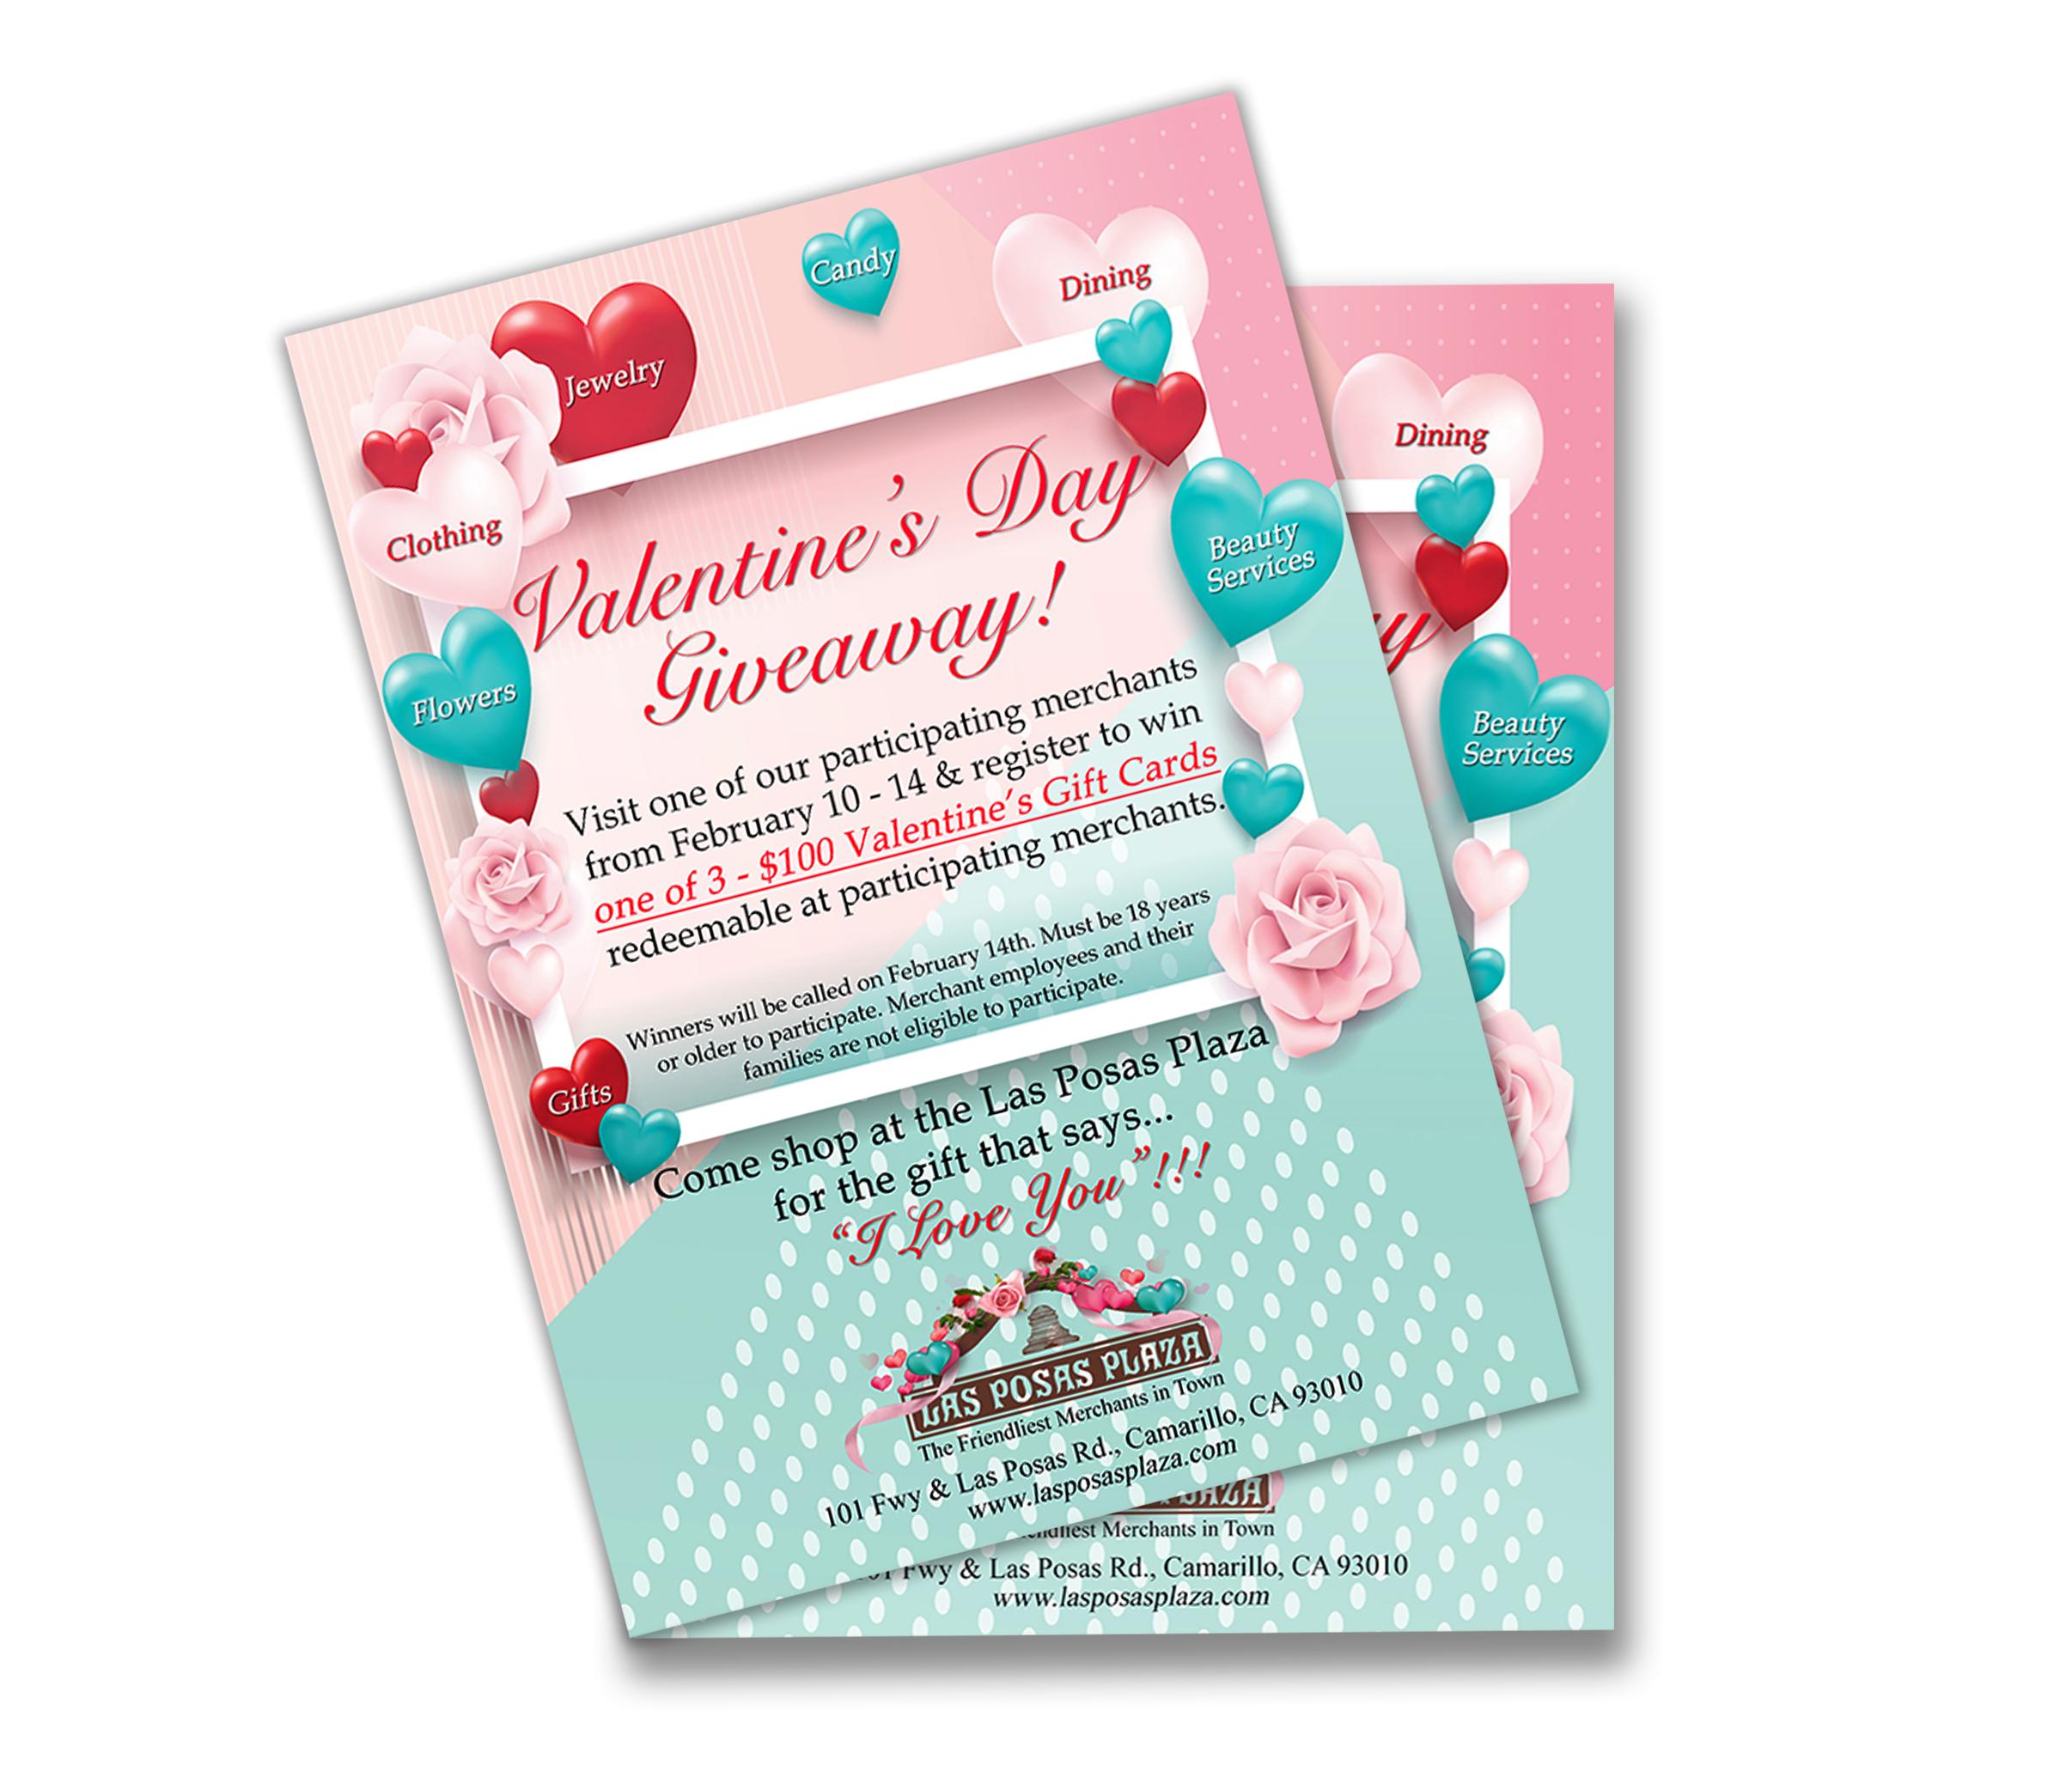 Valentine's Flyer Las Posas Plaza 2020